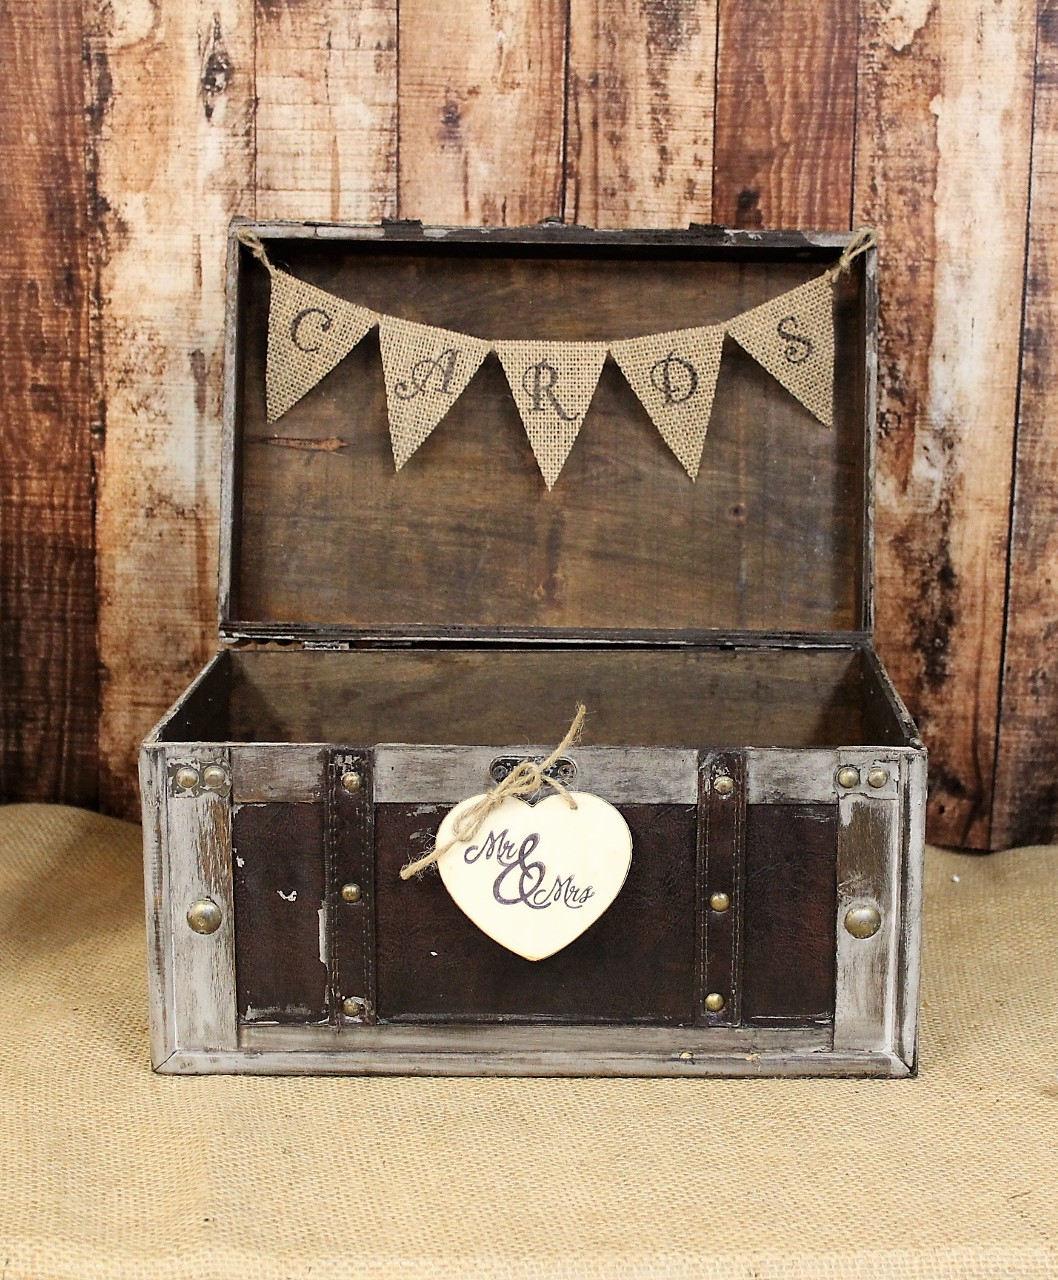 Wedding Card Box With Burlap Banner Rustic Shabby Chic Decor